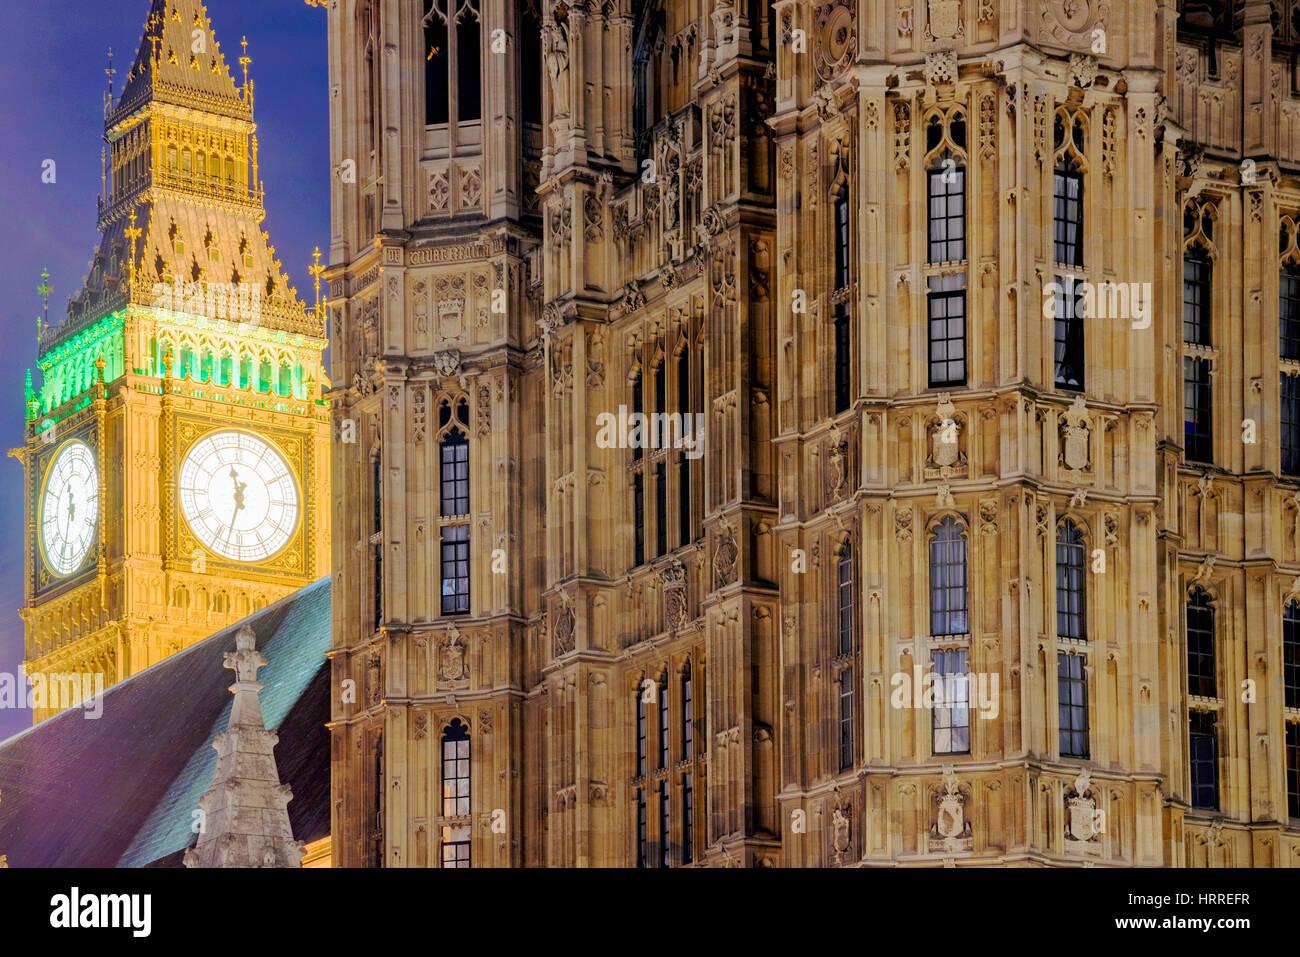 Close up of Big Ben at night time - Stock Image